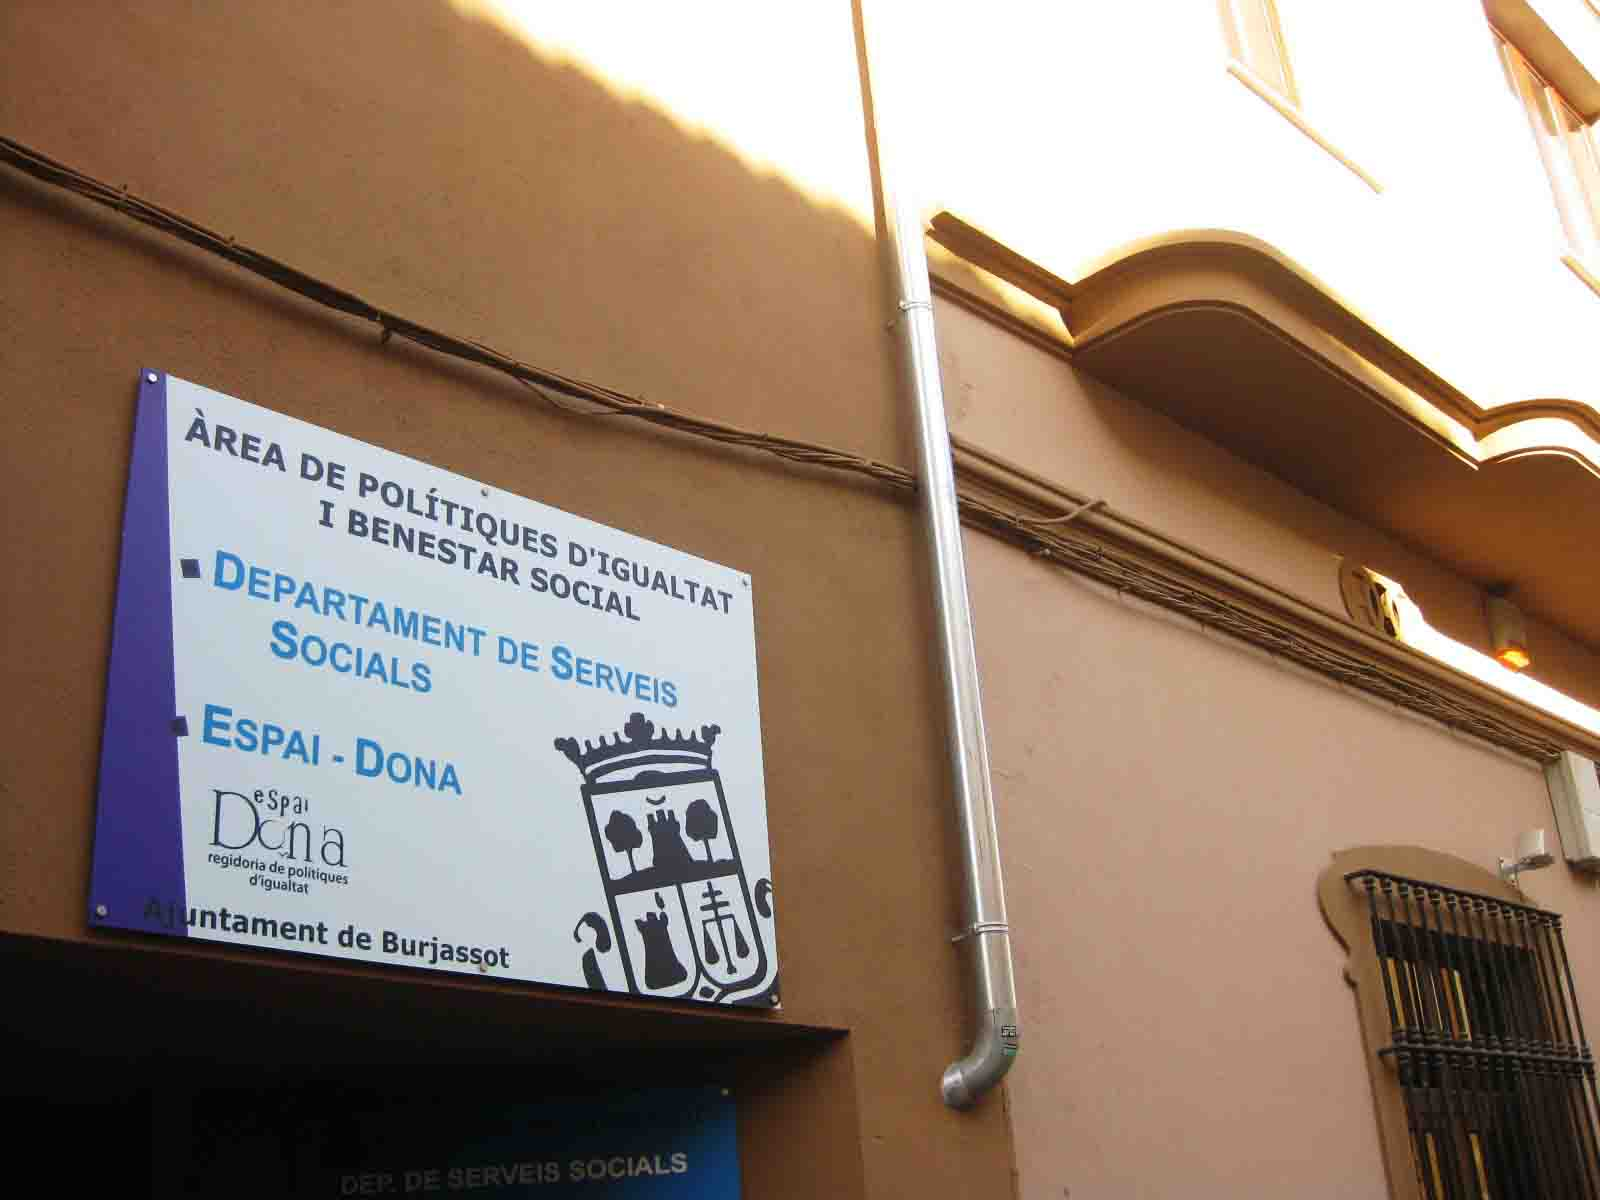 Burjassot pone en marcha la oficina municipal de vivienda intermediaci n hipotecaria y alquiler - Alquiler de pisos en burjassot ...